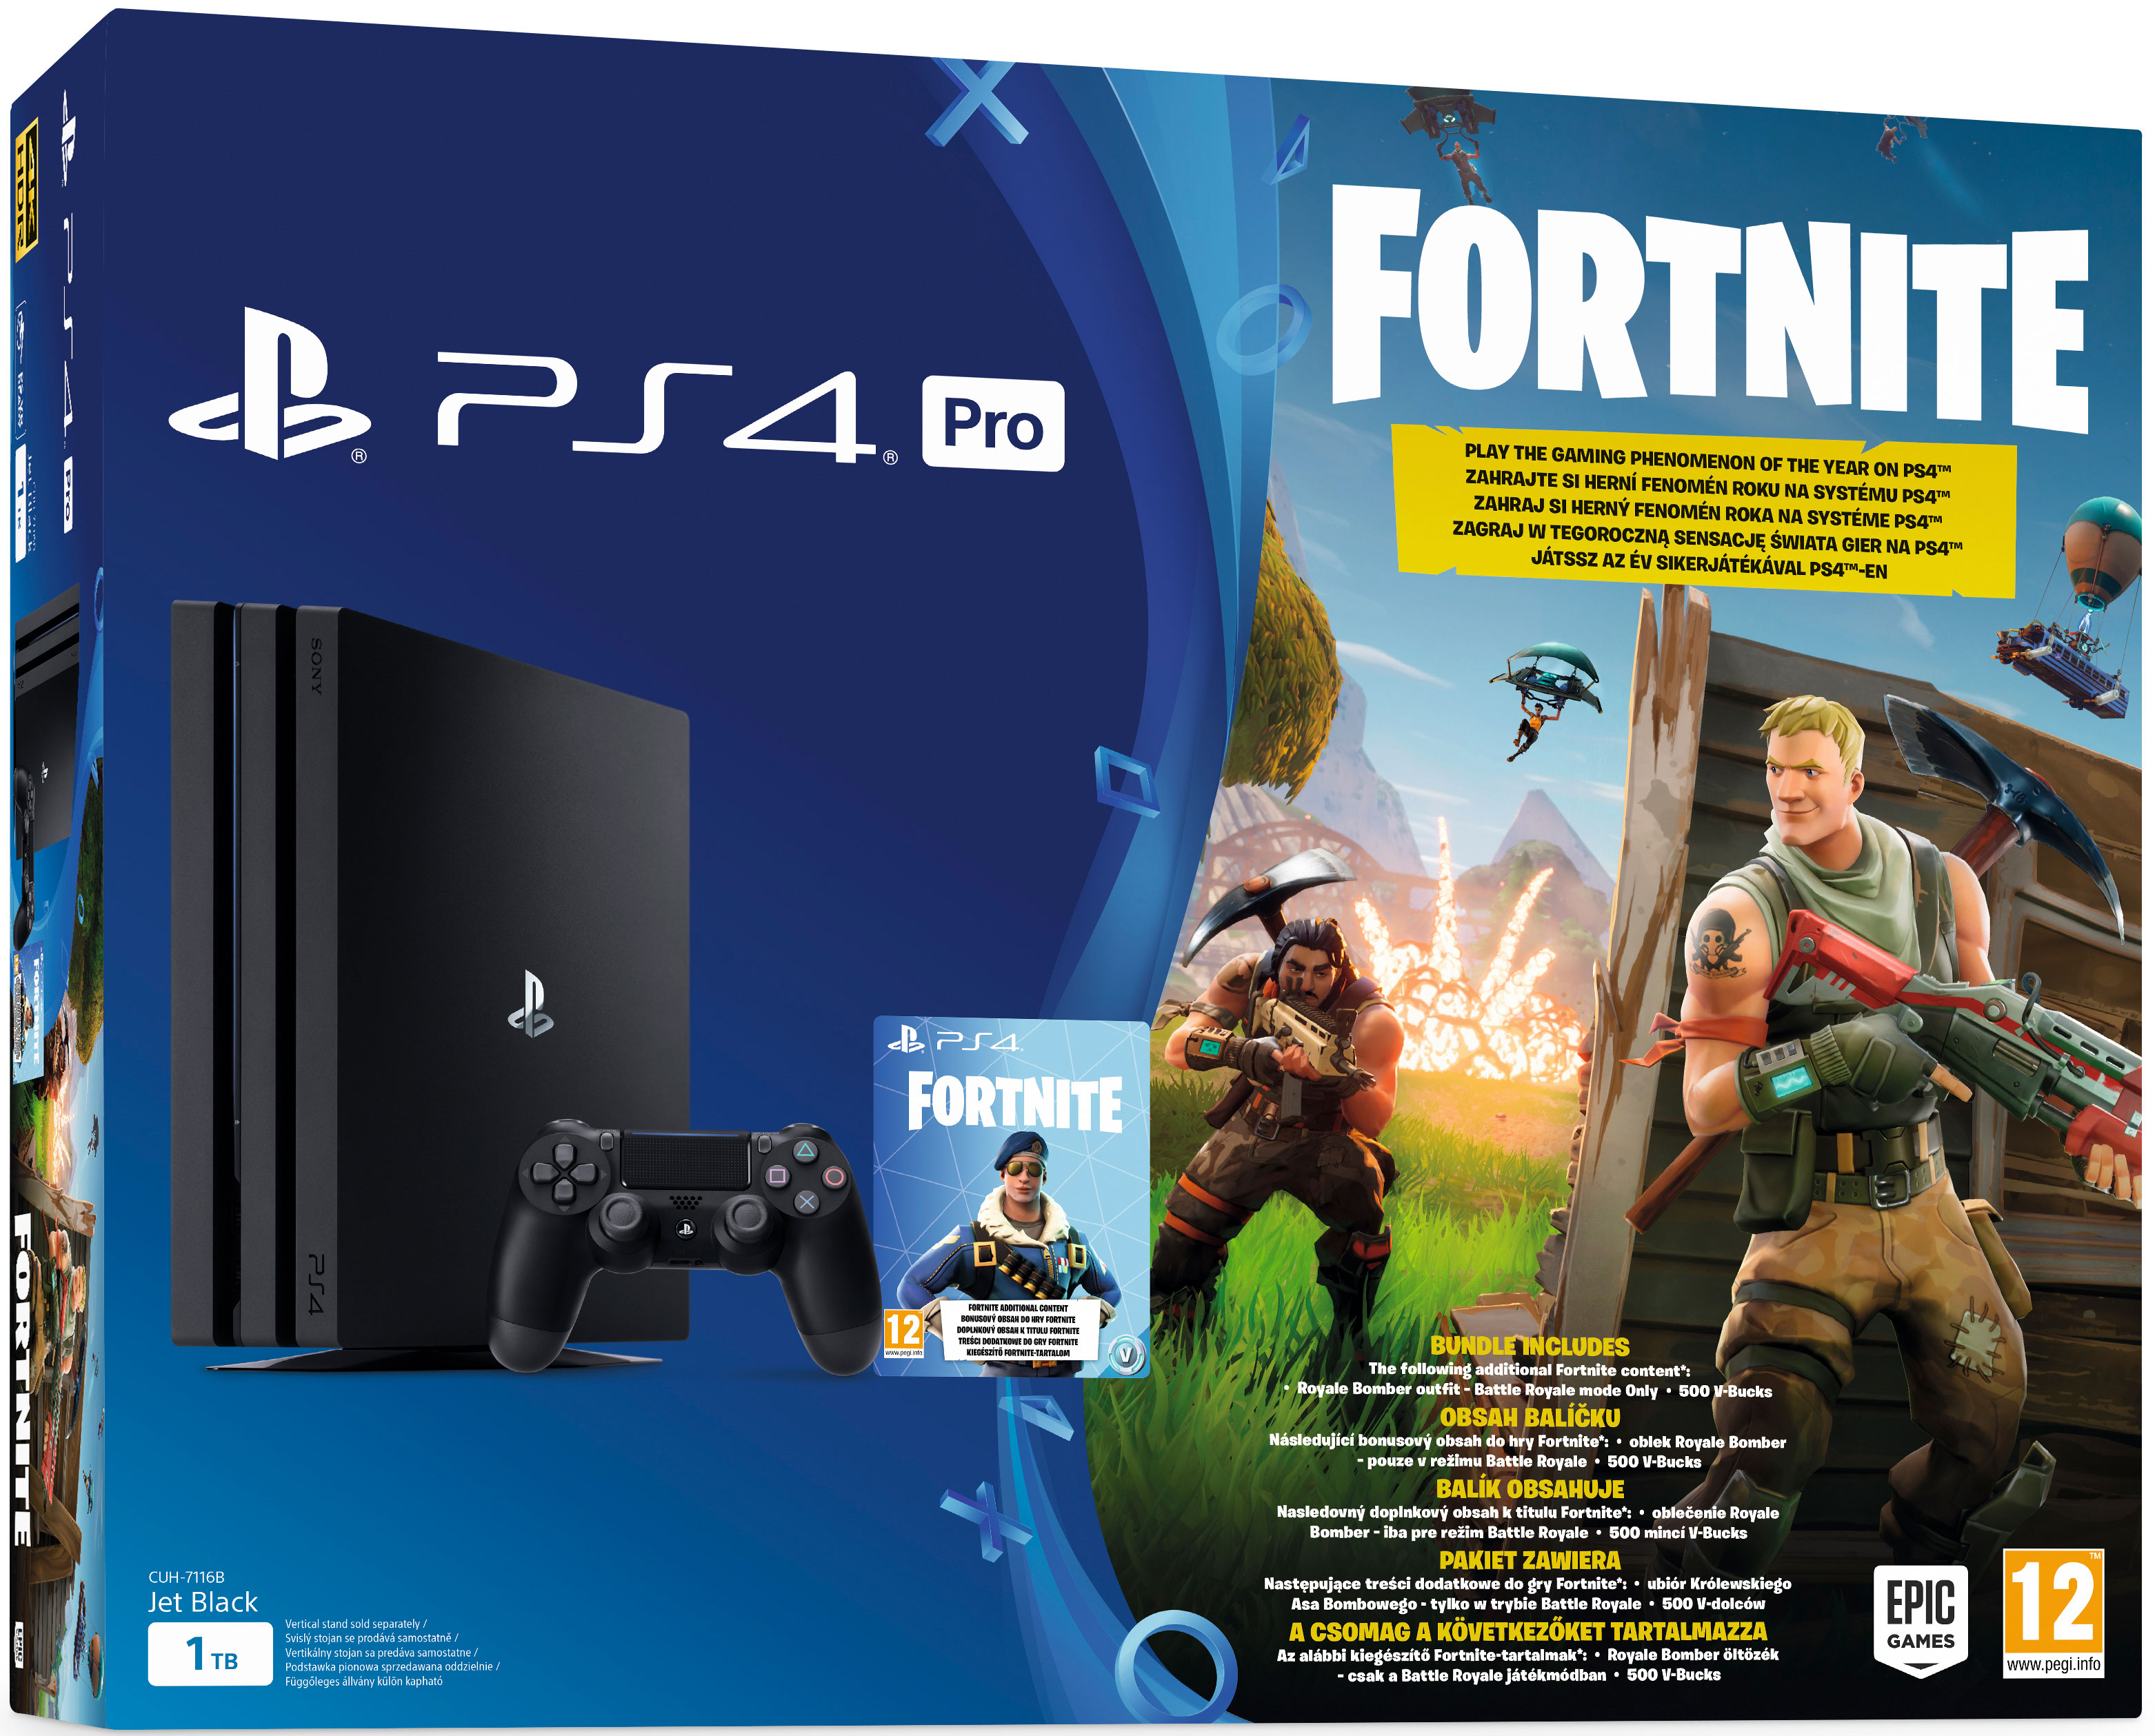 PlayStation 4 Pro 1 TB  Fortnite Bundle